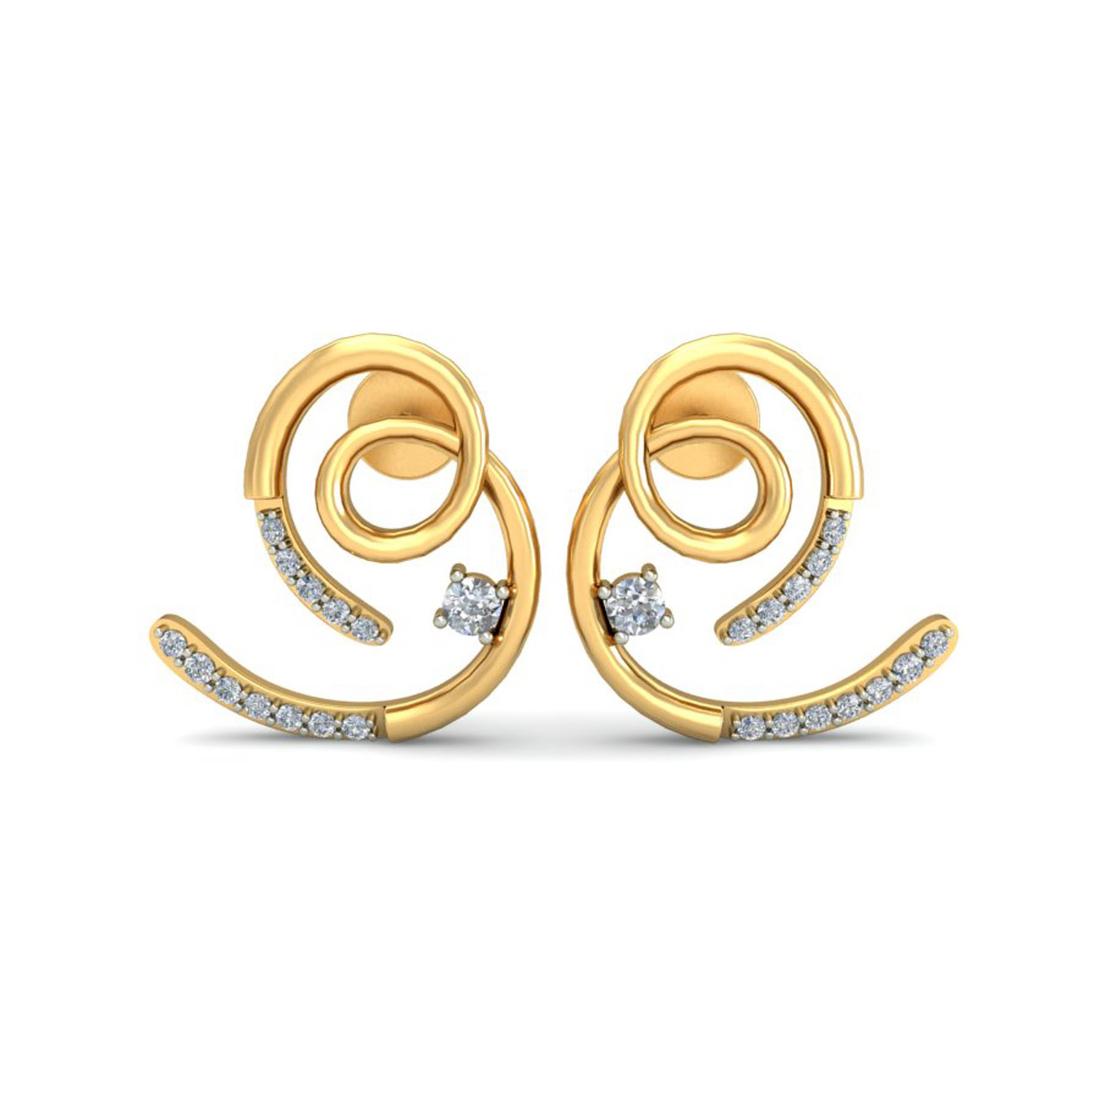 Ornomart's precious curl Earrings